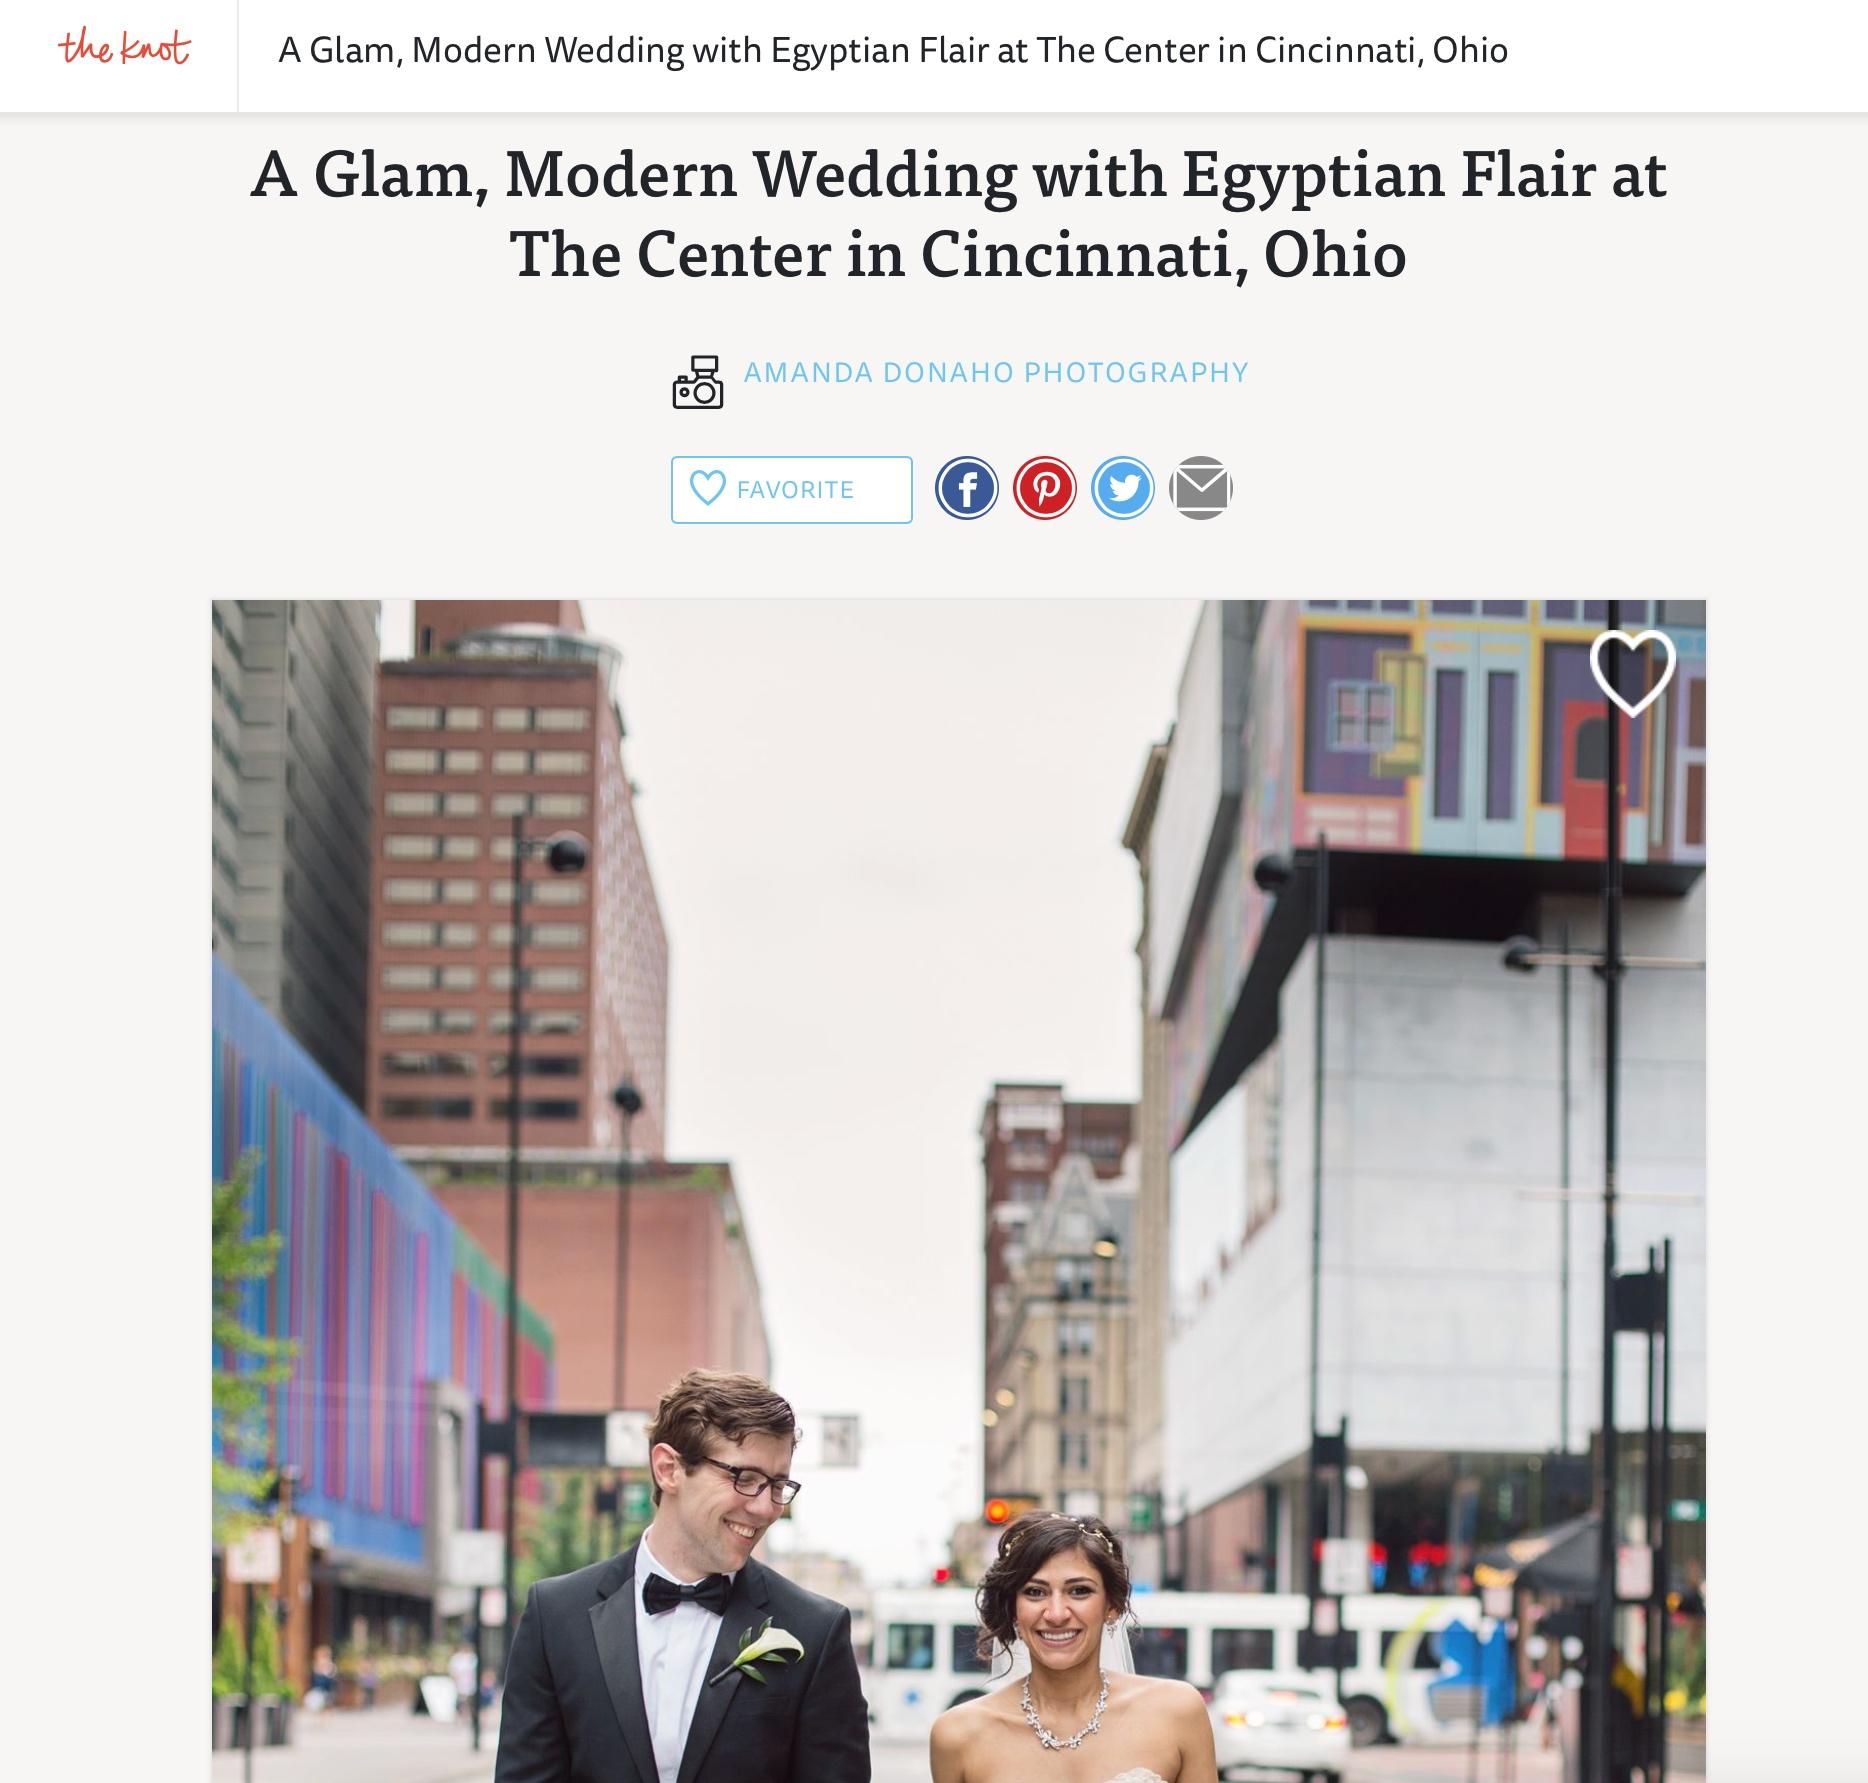 Glamorous Wedding with Egyptian Flair